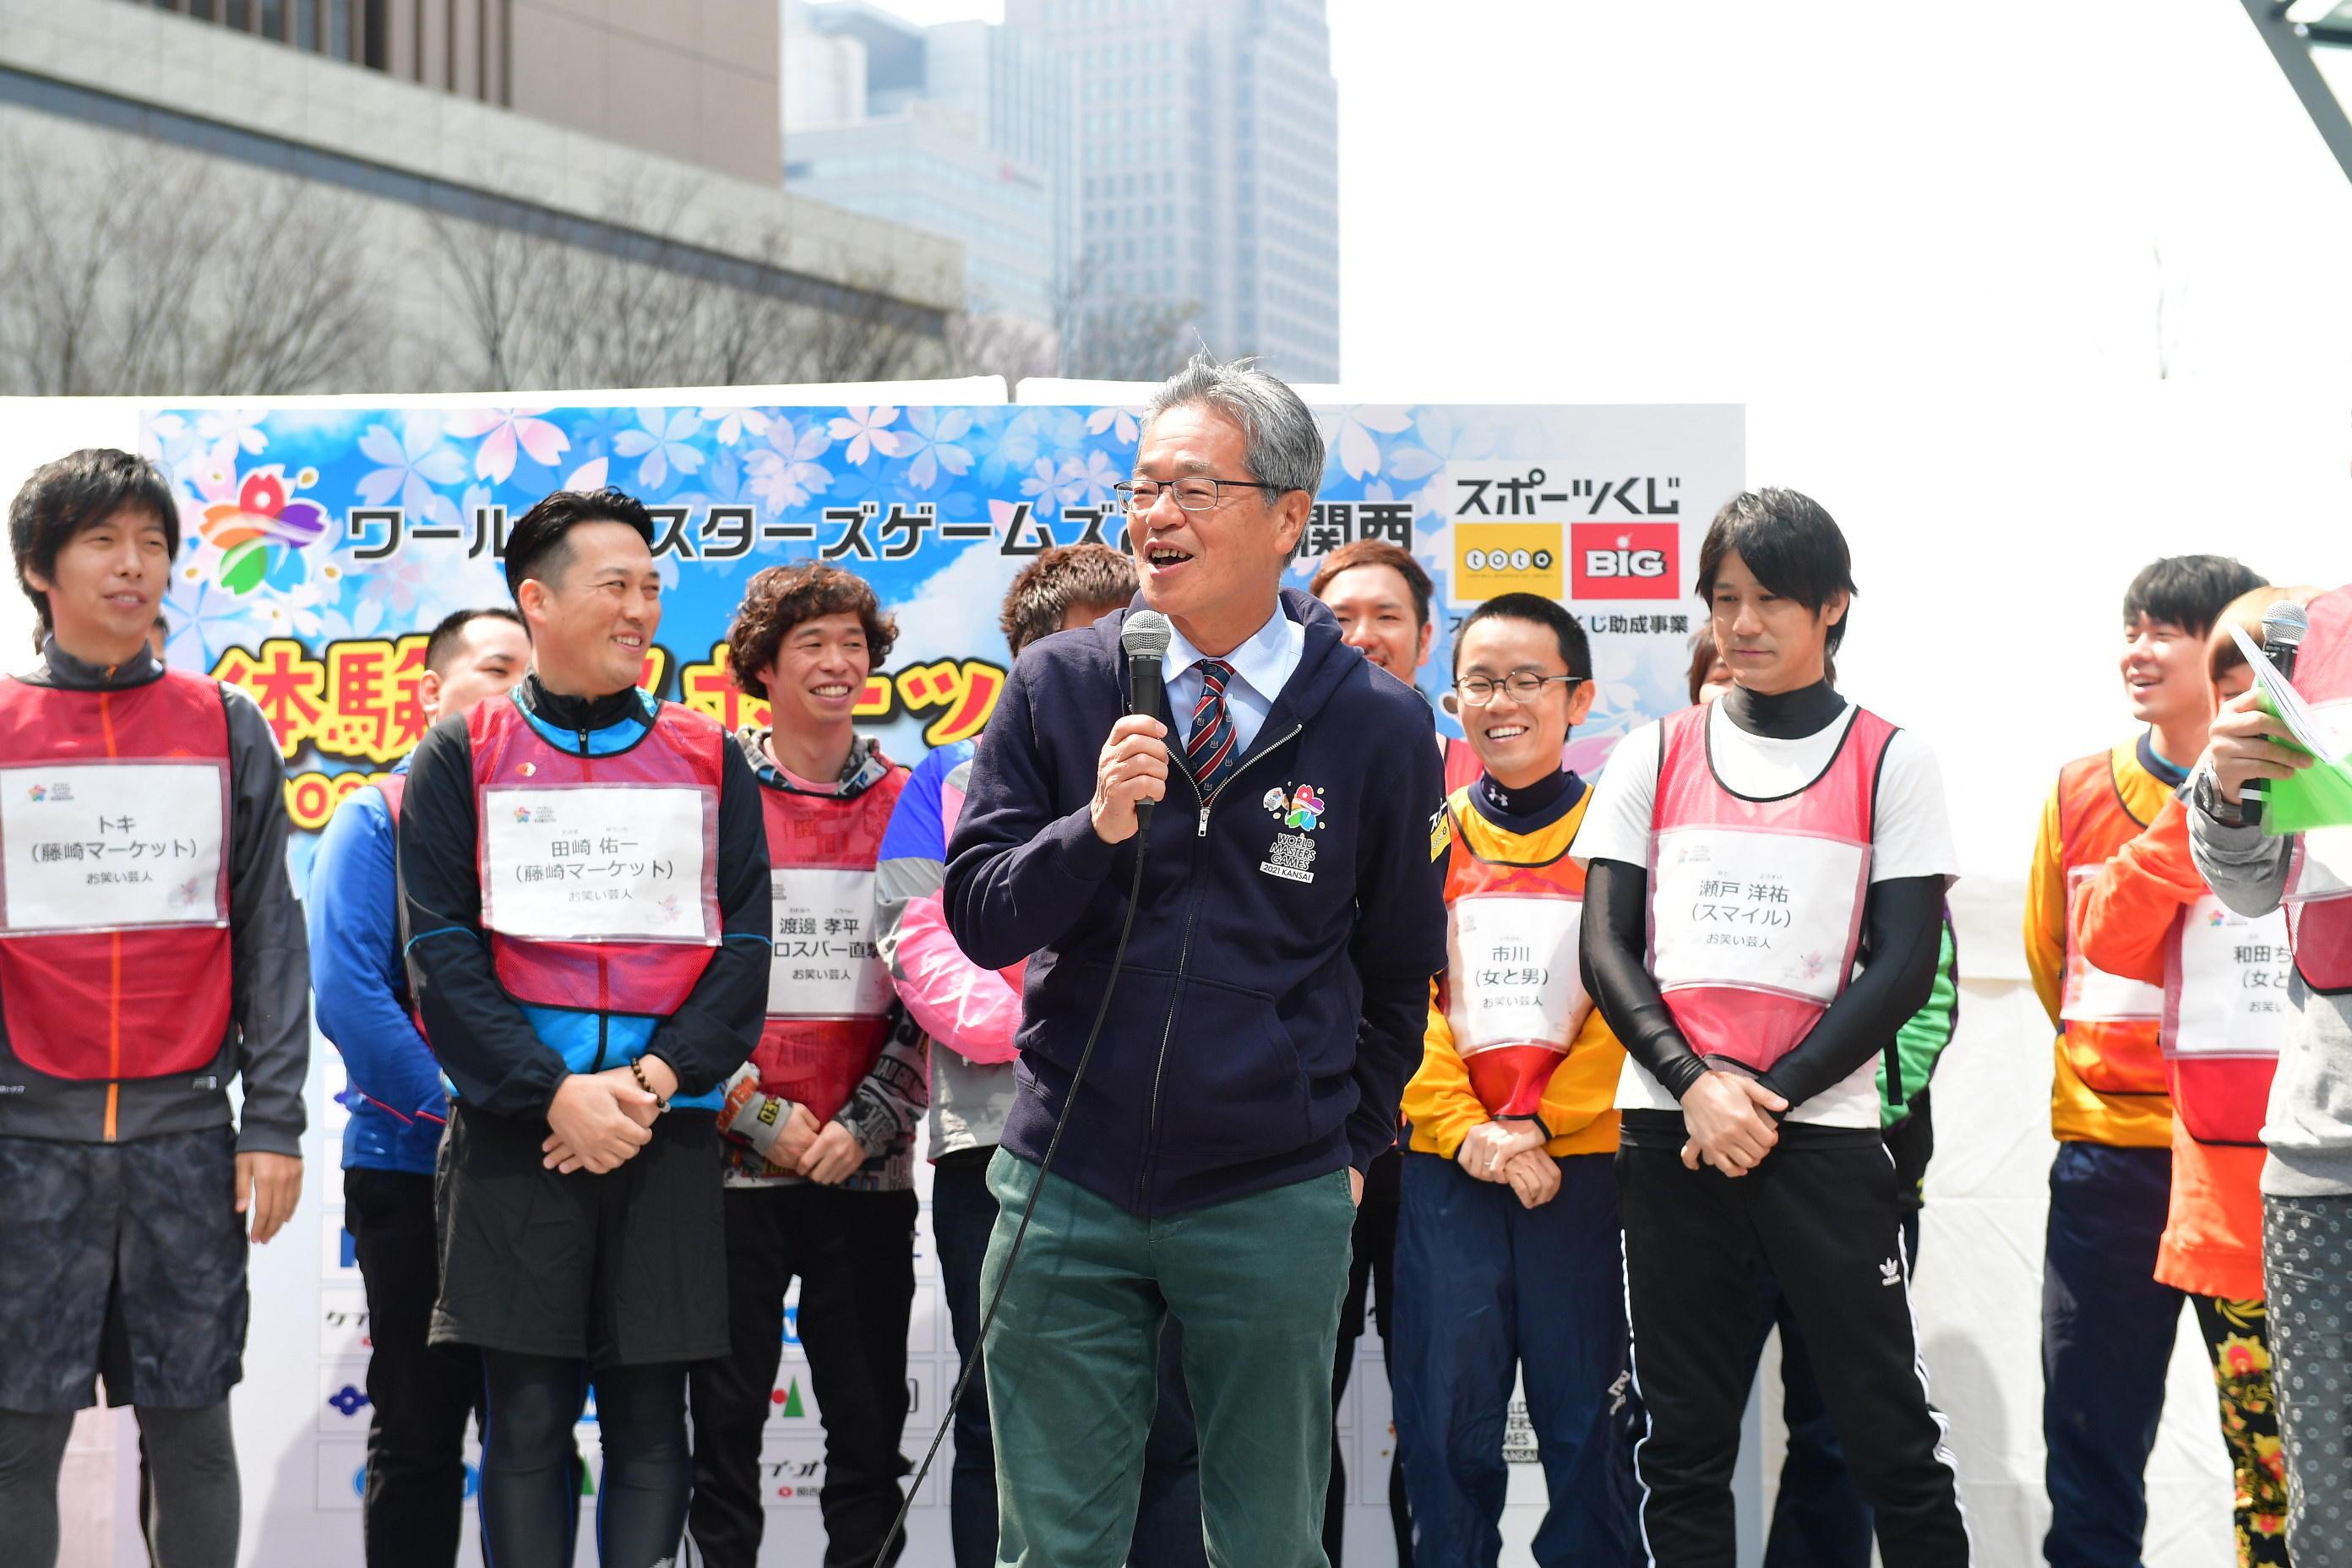 http://news.yoshimoto.co.jp/20180325175214-3f4cea14b74208c7034f66fdcb71138898458a9d.jpg